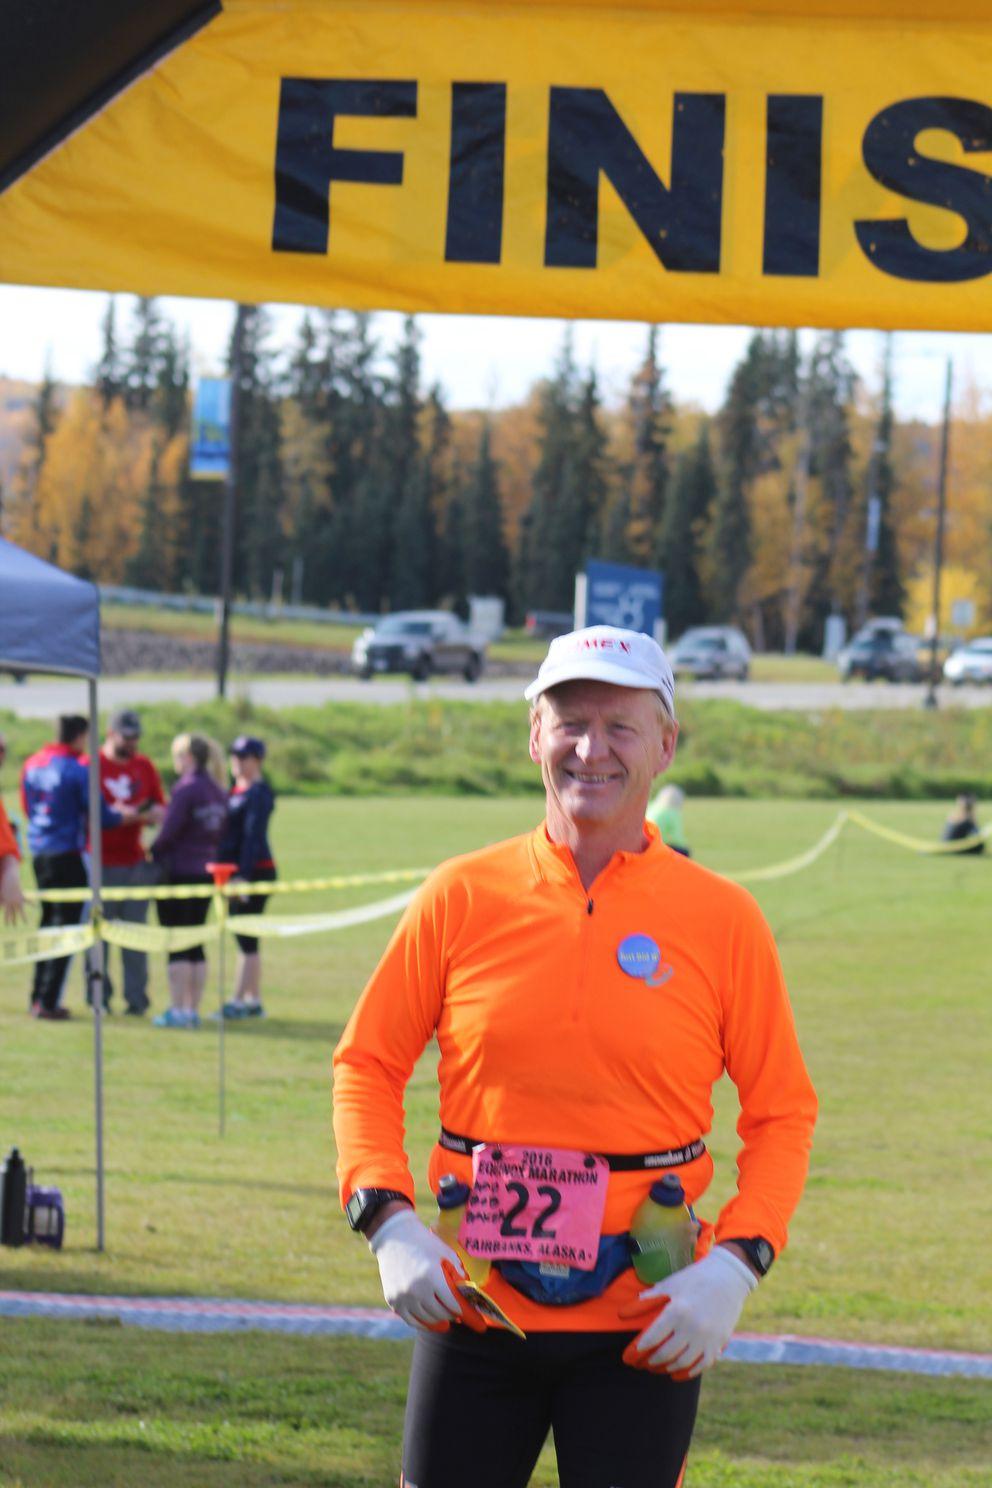 Bob Baker finished the Equinox Marathon Saturday at the University of Alaska Fairbanks. (Dermot Cole / Alaska Dispatch News)